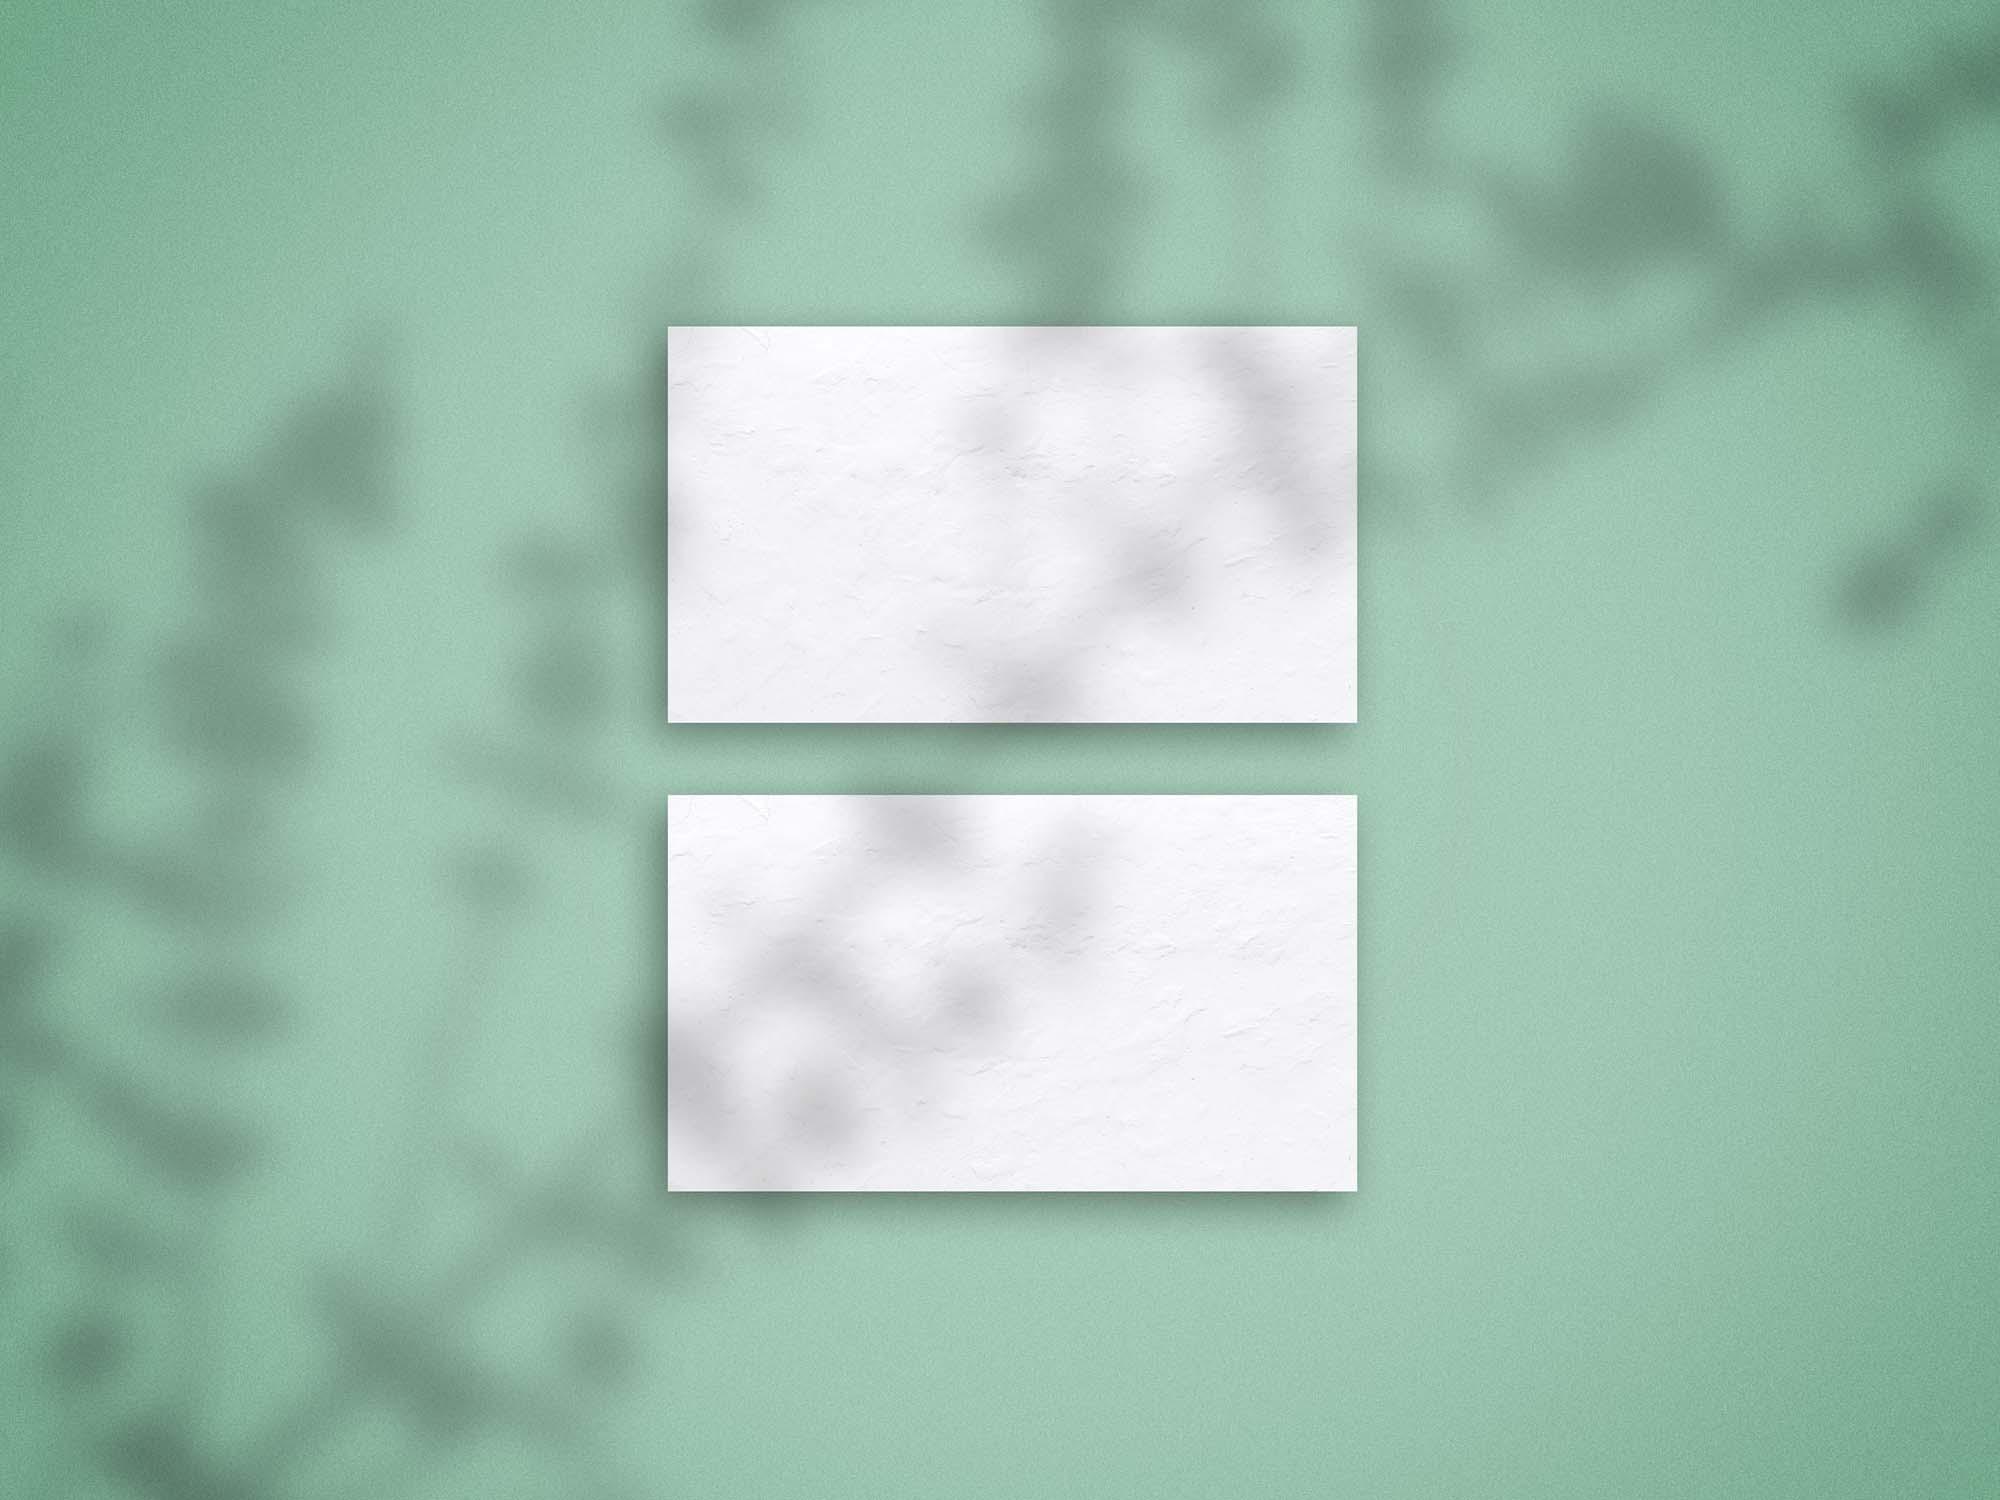 Shadow Overlay Business Card Mockup 2